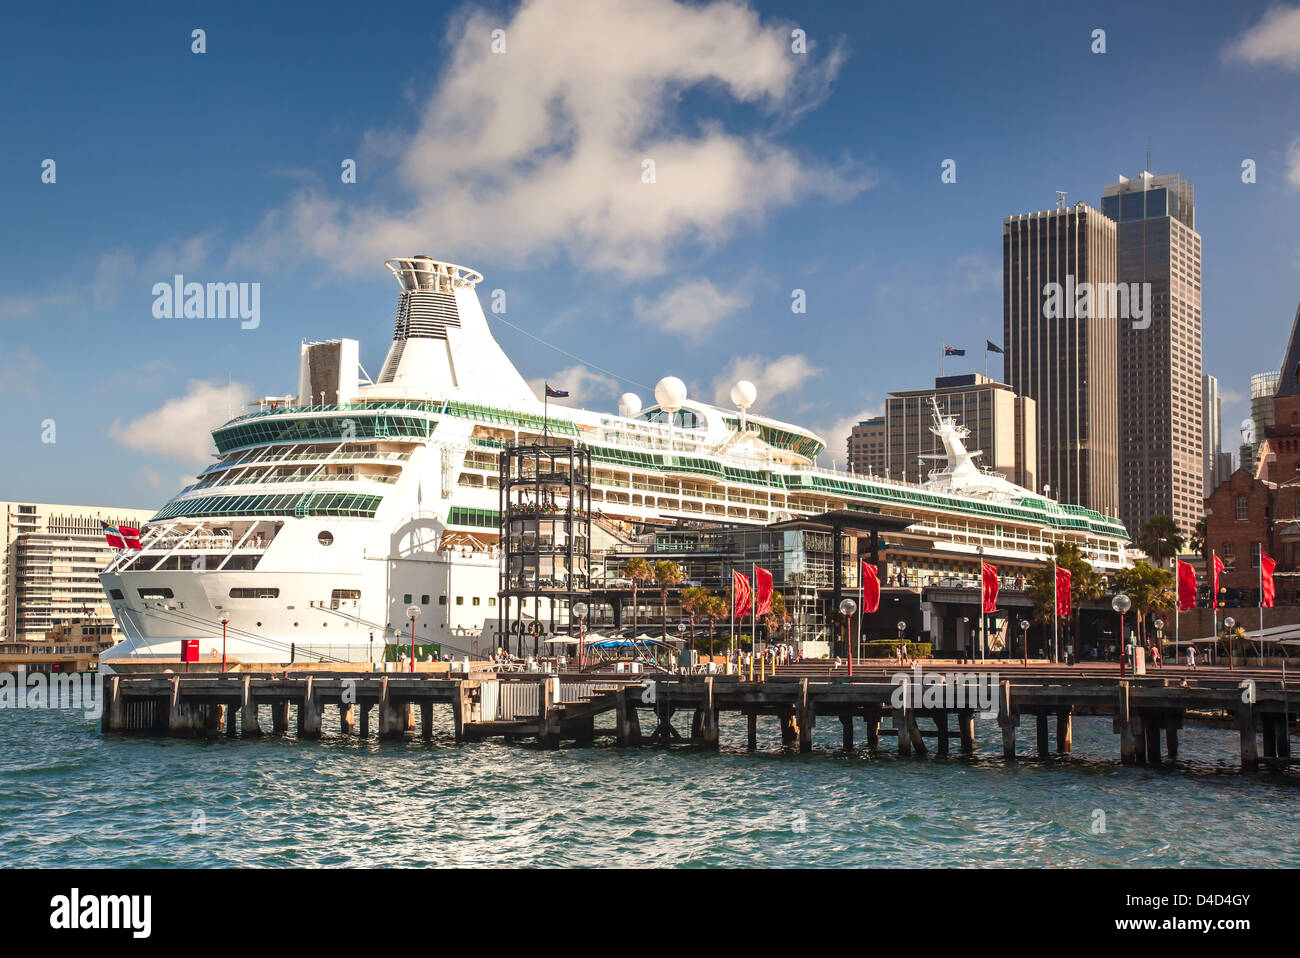 Sydney overseas passenger terminal - Stock Image